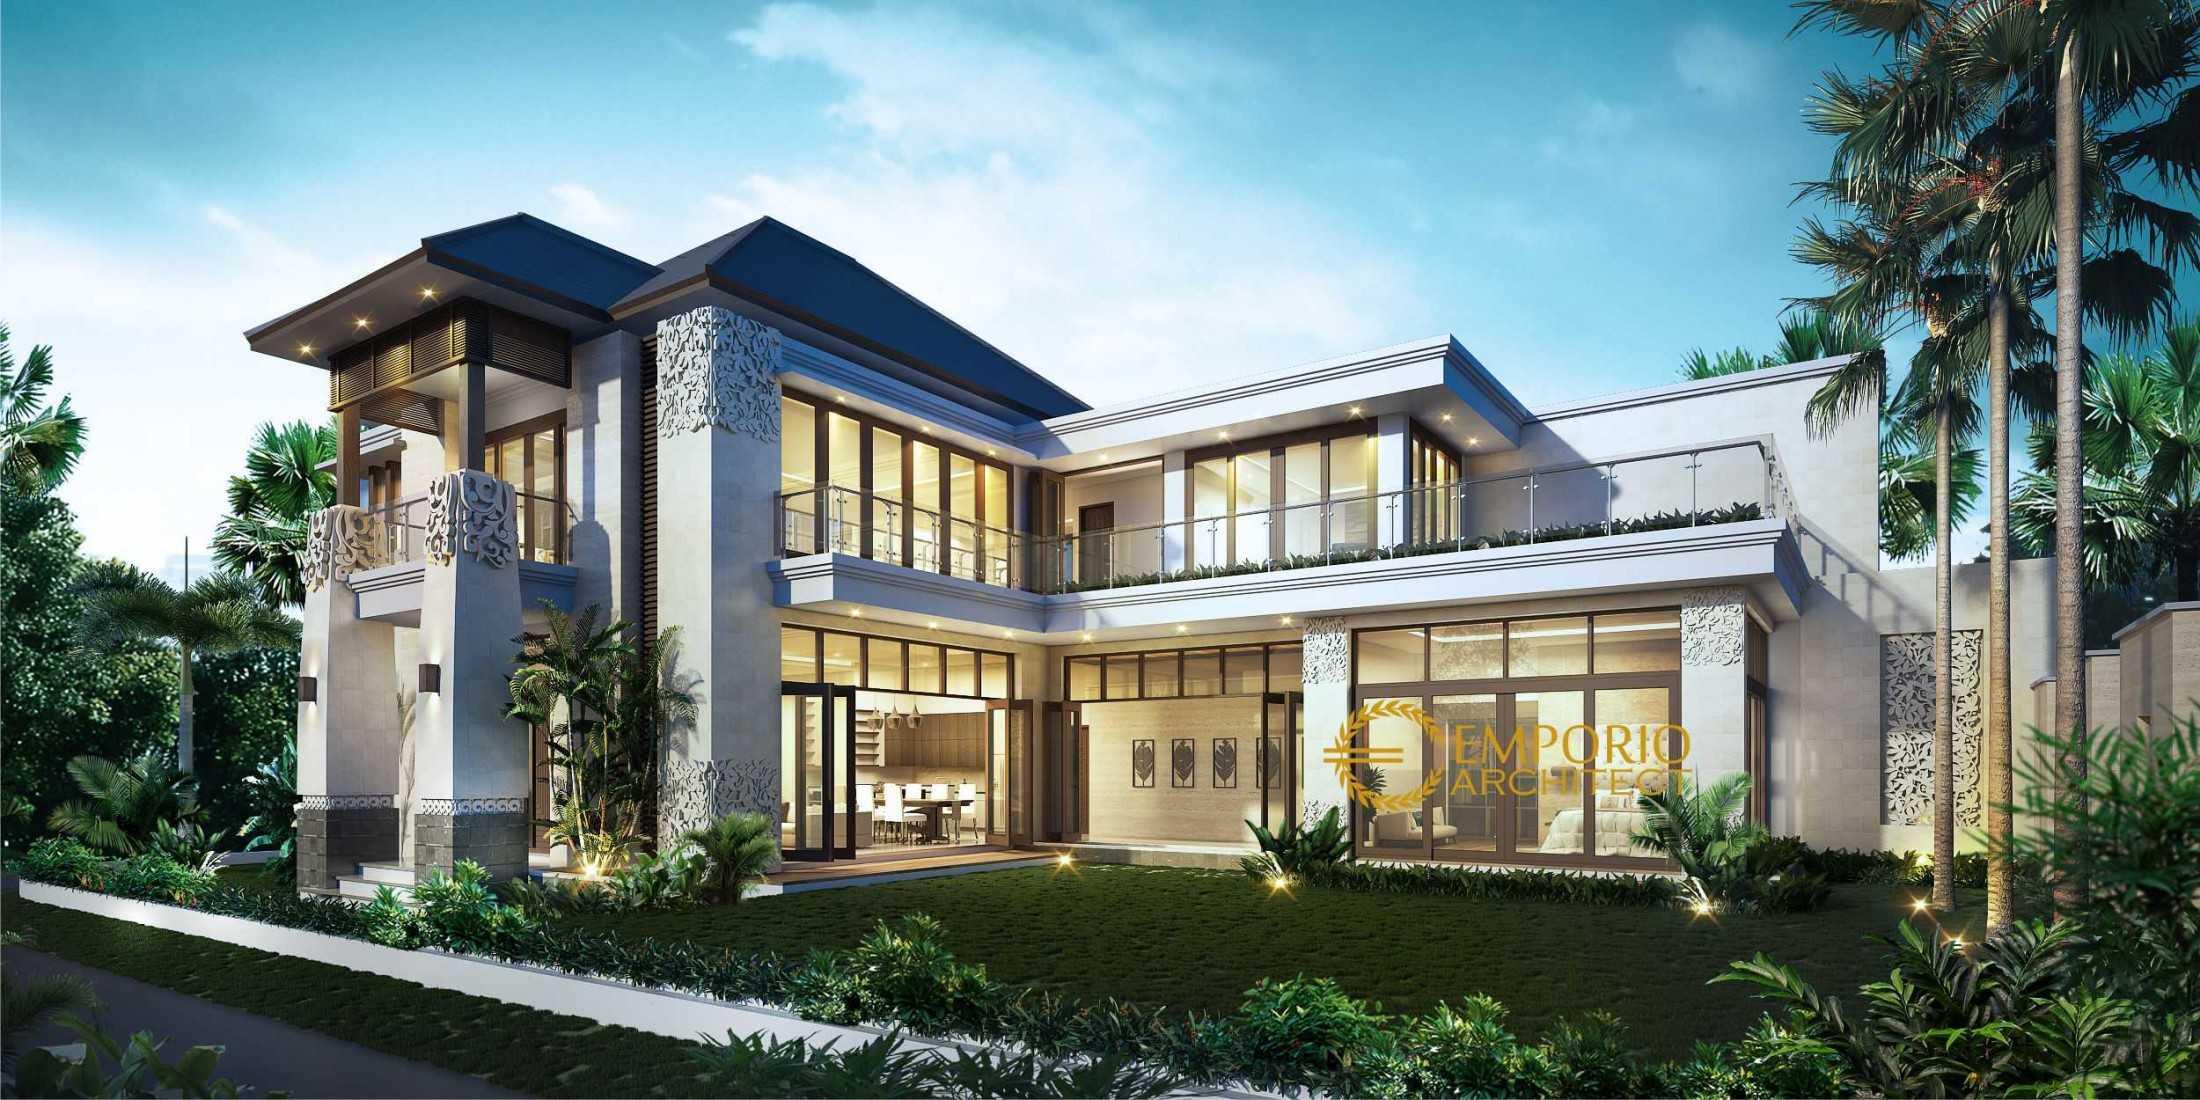 Emporio Architect Jasa Arsitek Makassar Desain Rumah Villa Bali Tropis 225 @ Makassar Makassar, Kota Makassar, Sulawesi Selatan, Indonesia Makassar, Kota Makassar, Sulawesi Selatan, Indonesia Emporio-Architect-Jasa-Arsitek-Makassar-Desain-Rumah-Villa-Bali-Tropis-225-Makassar  84124